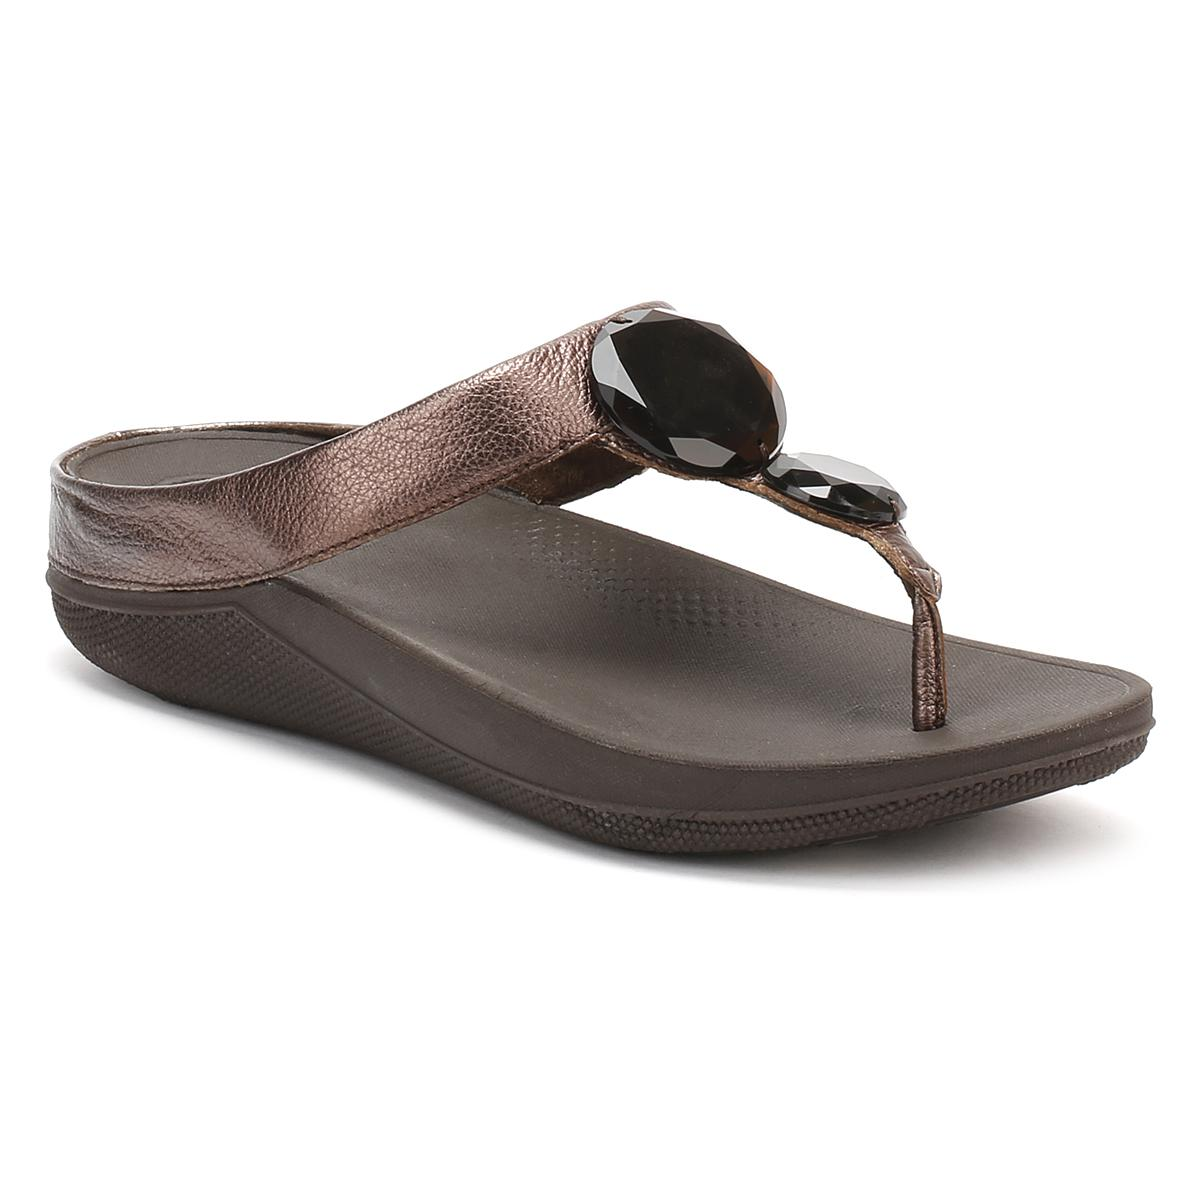 c3d014362 Fitflop Womens Bronze Luna Pop Sandals in Brown - Lyst